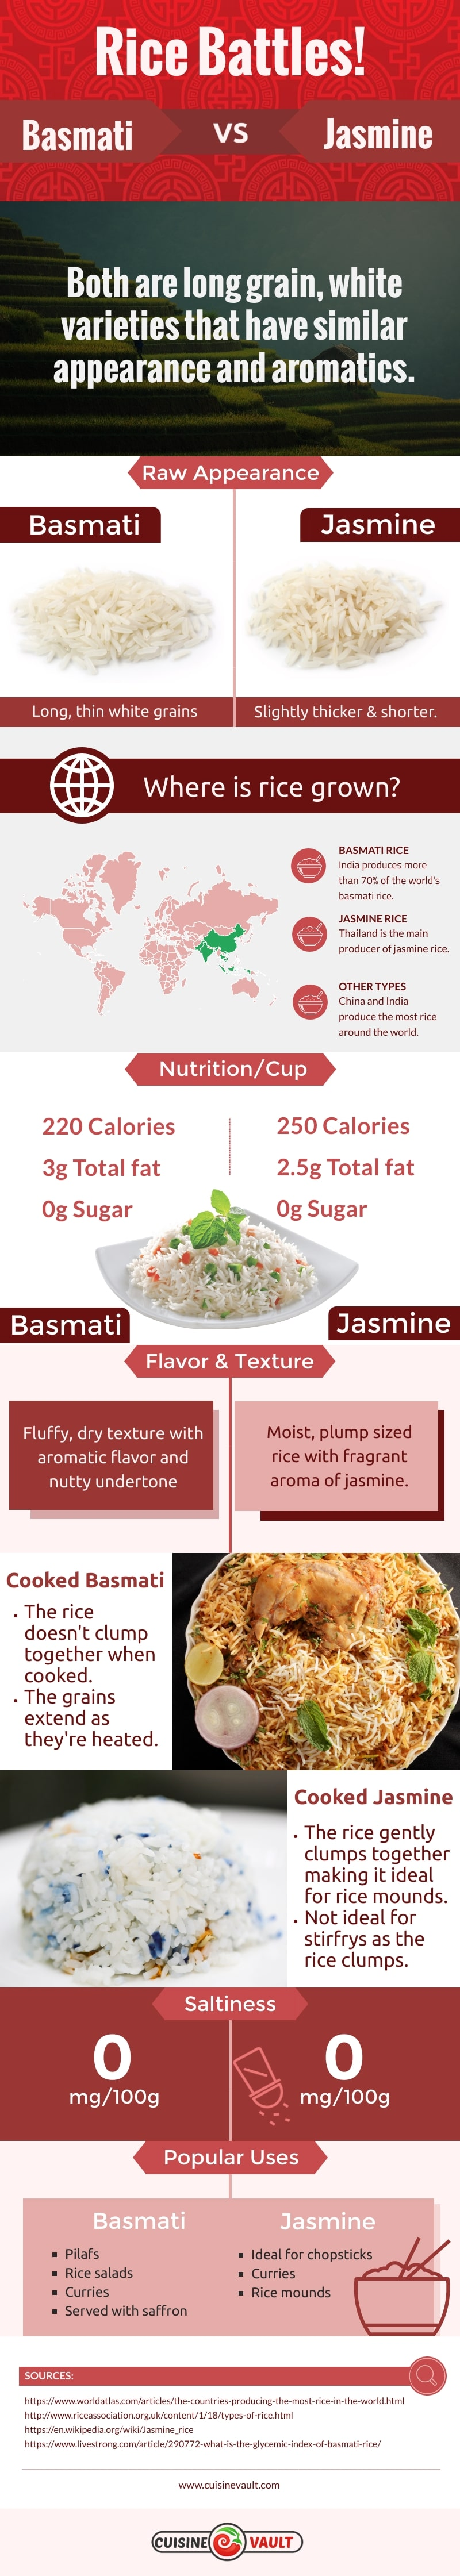 The Battle of Basmati Rice Vs Jasmine Rice - Infographic